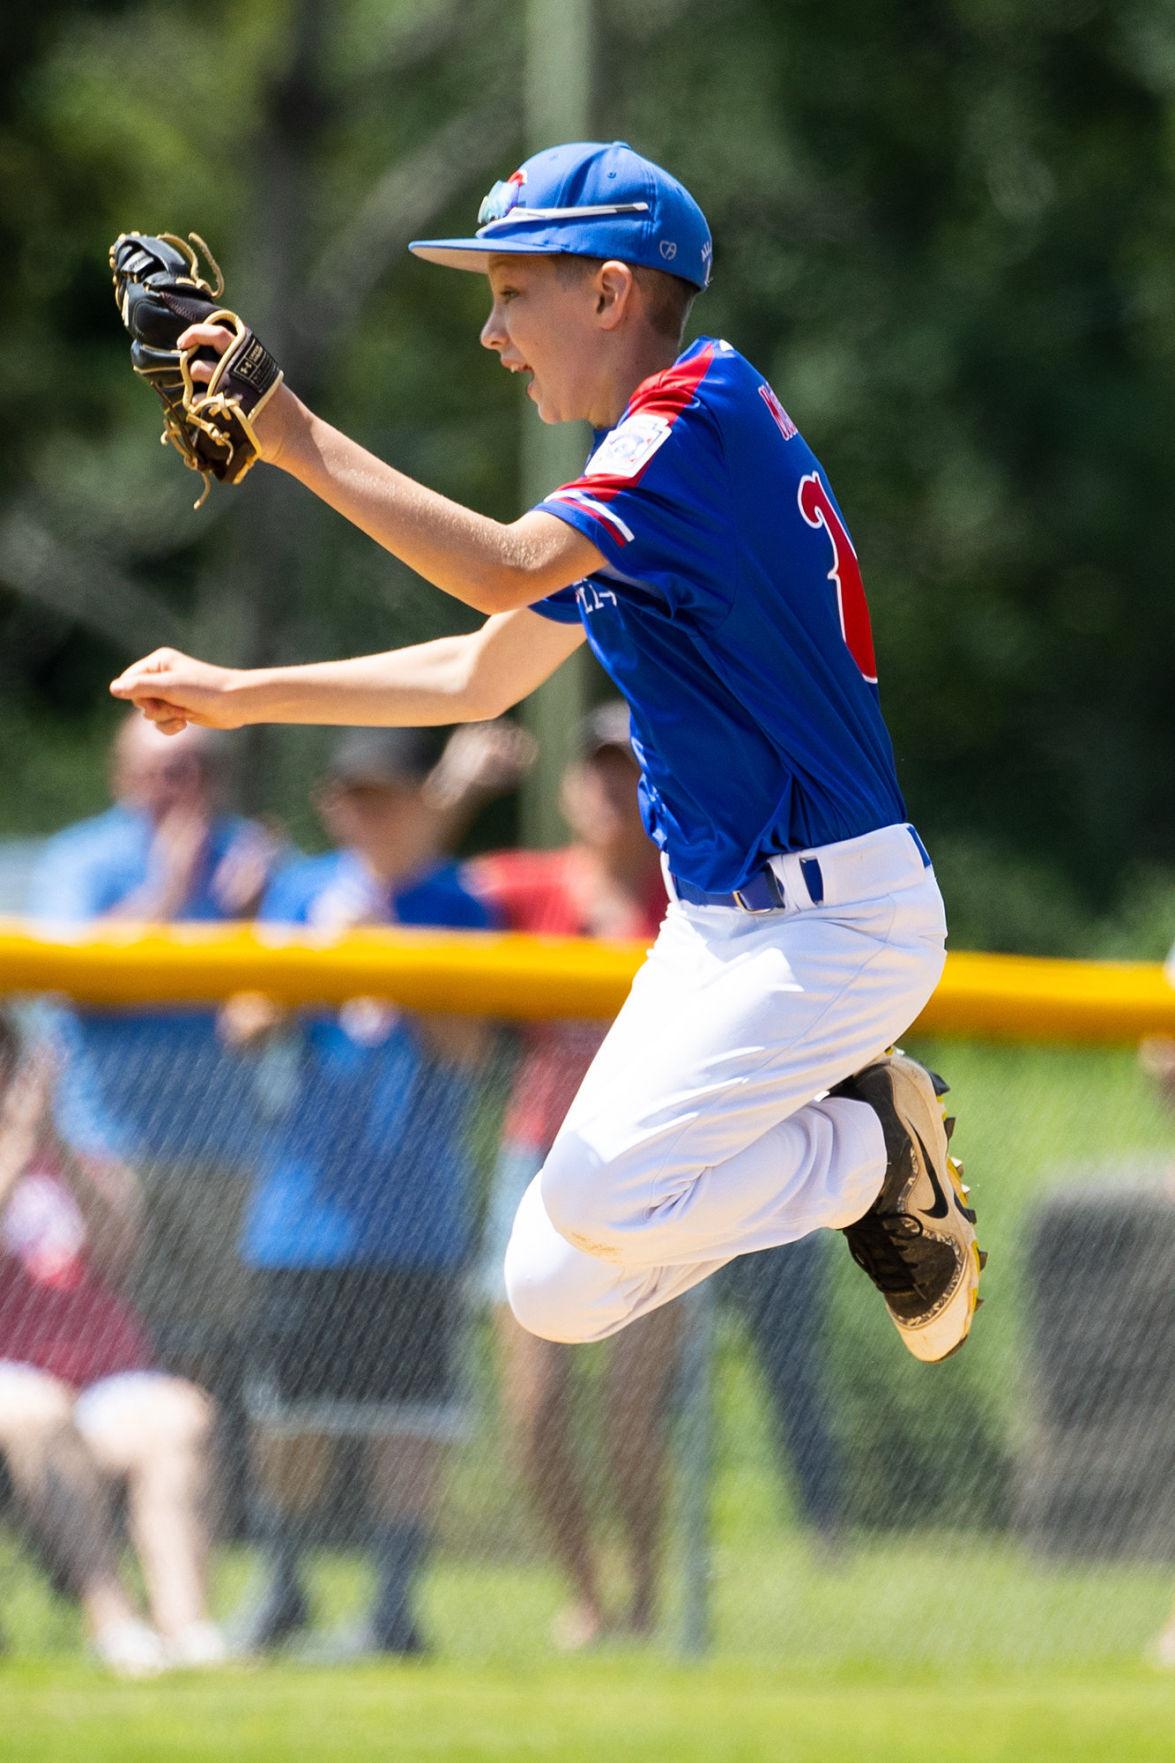 Lakeland claims District 32 Majors Baseball championship